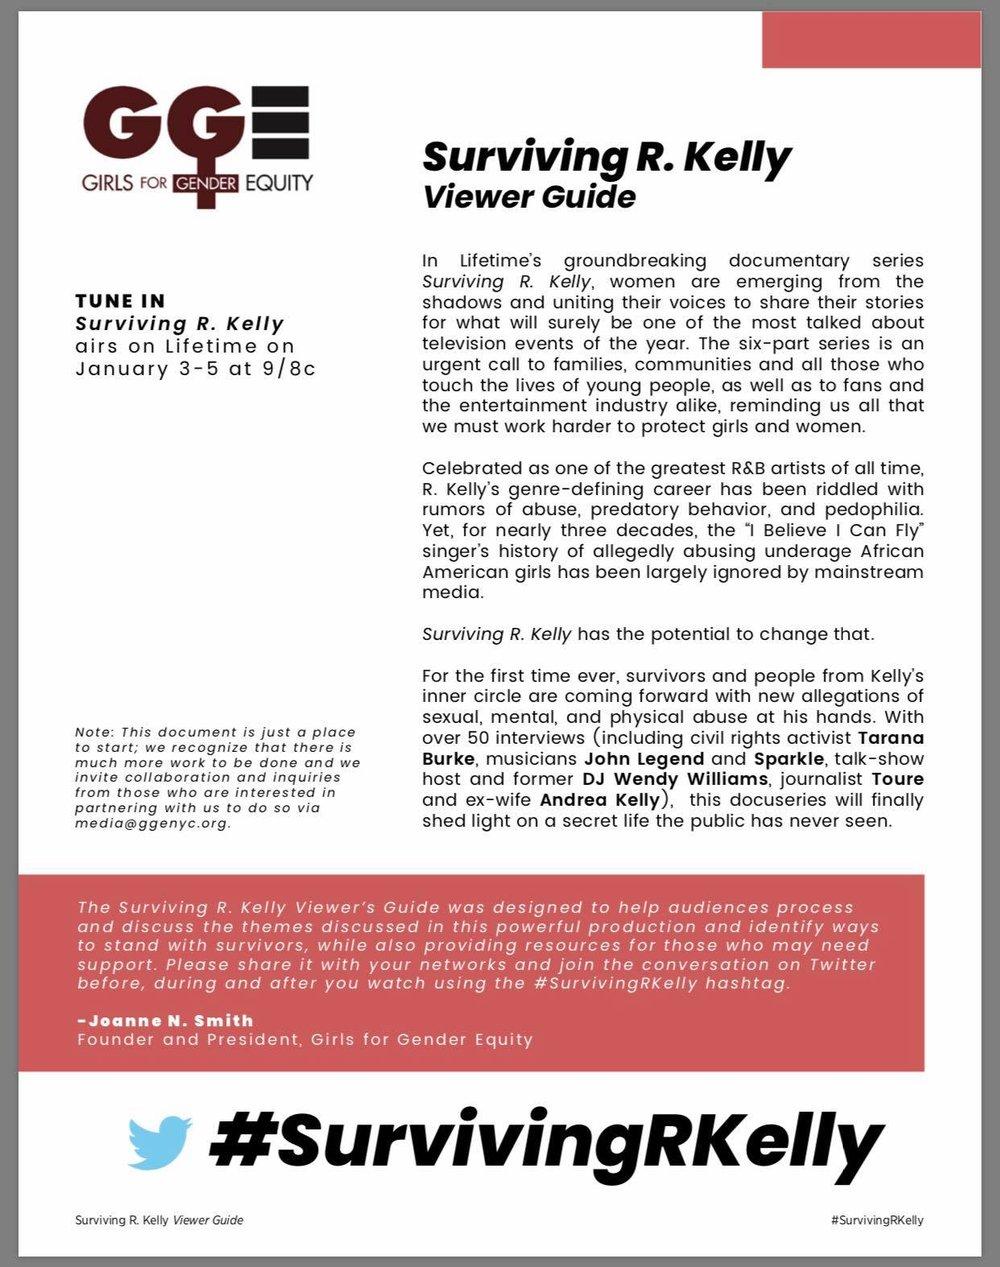 - Surviving R. Kelly - Viewer Guidewww.ggenyc.org/survivingrkelly